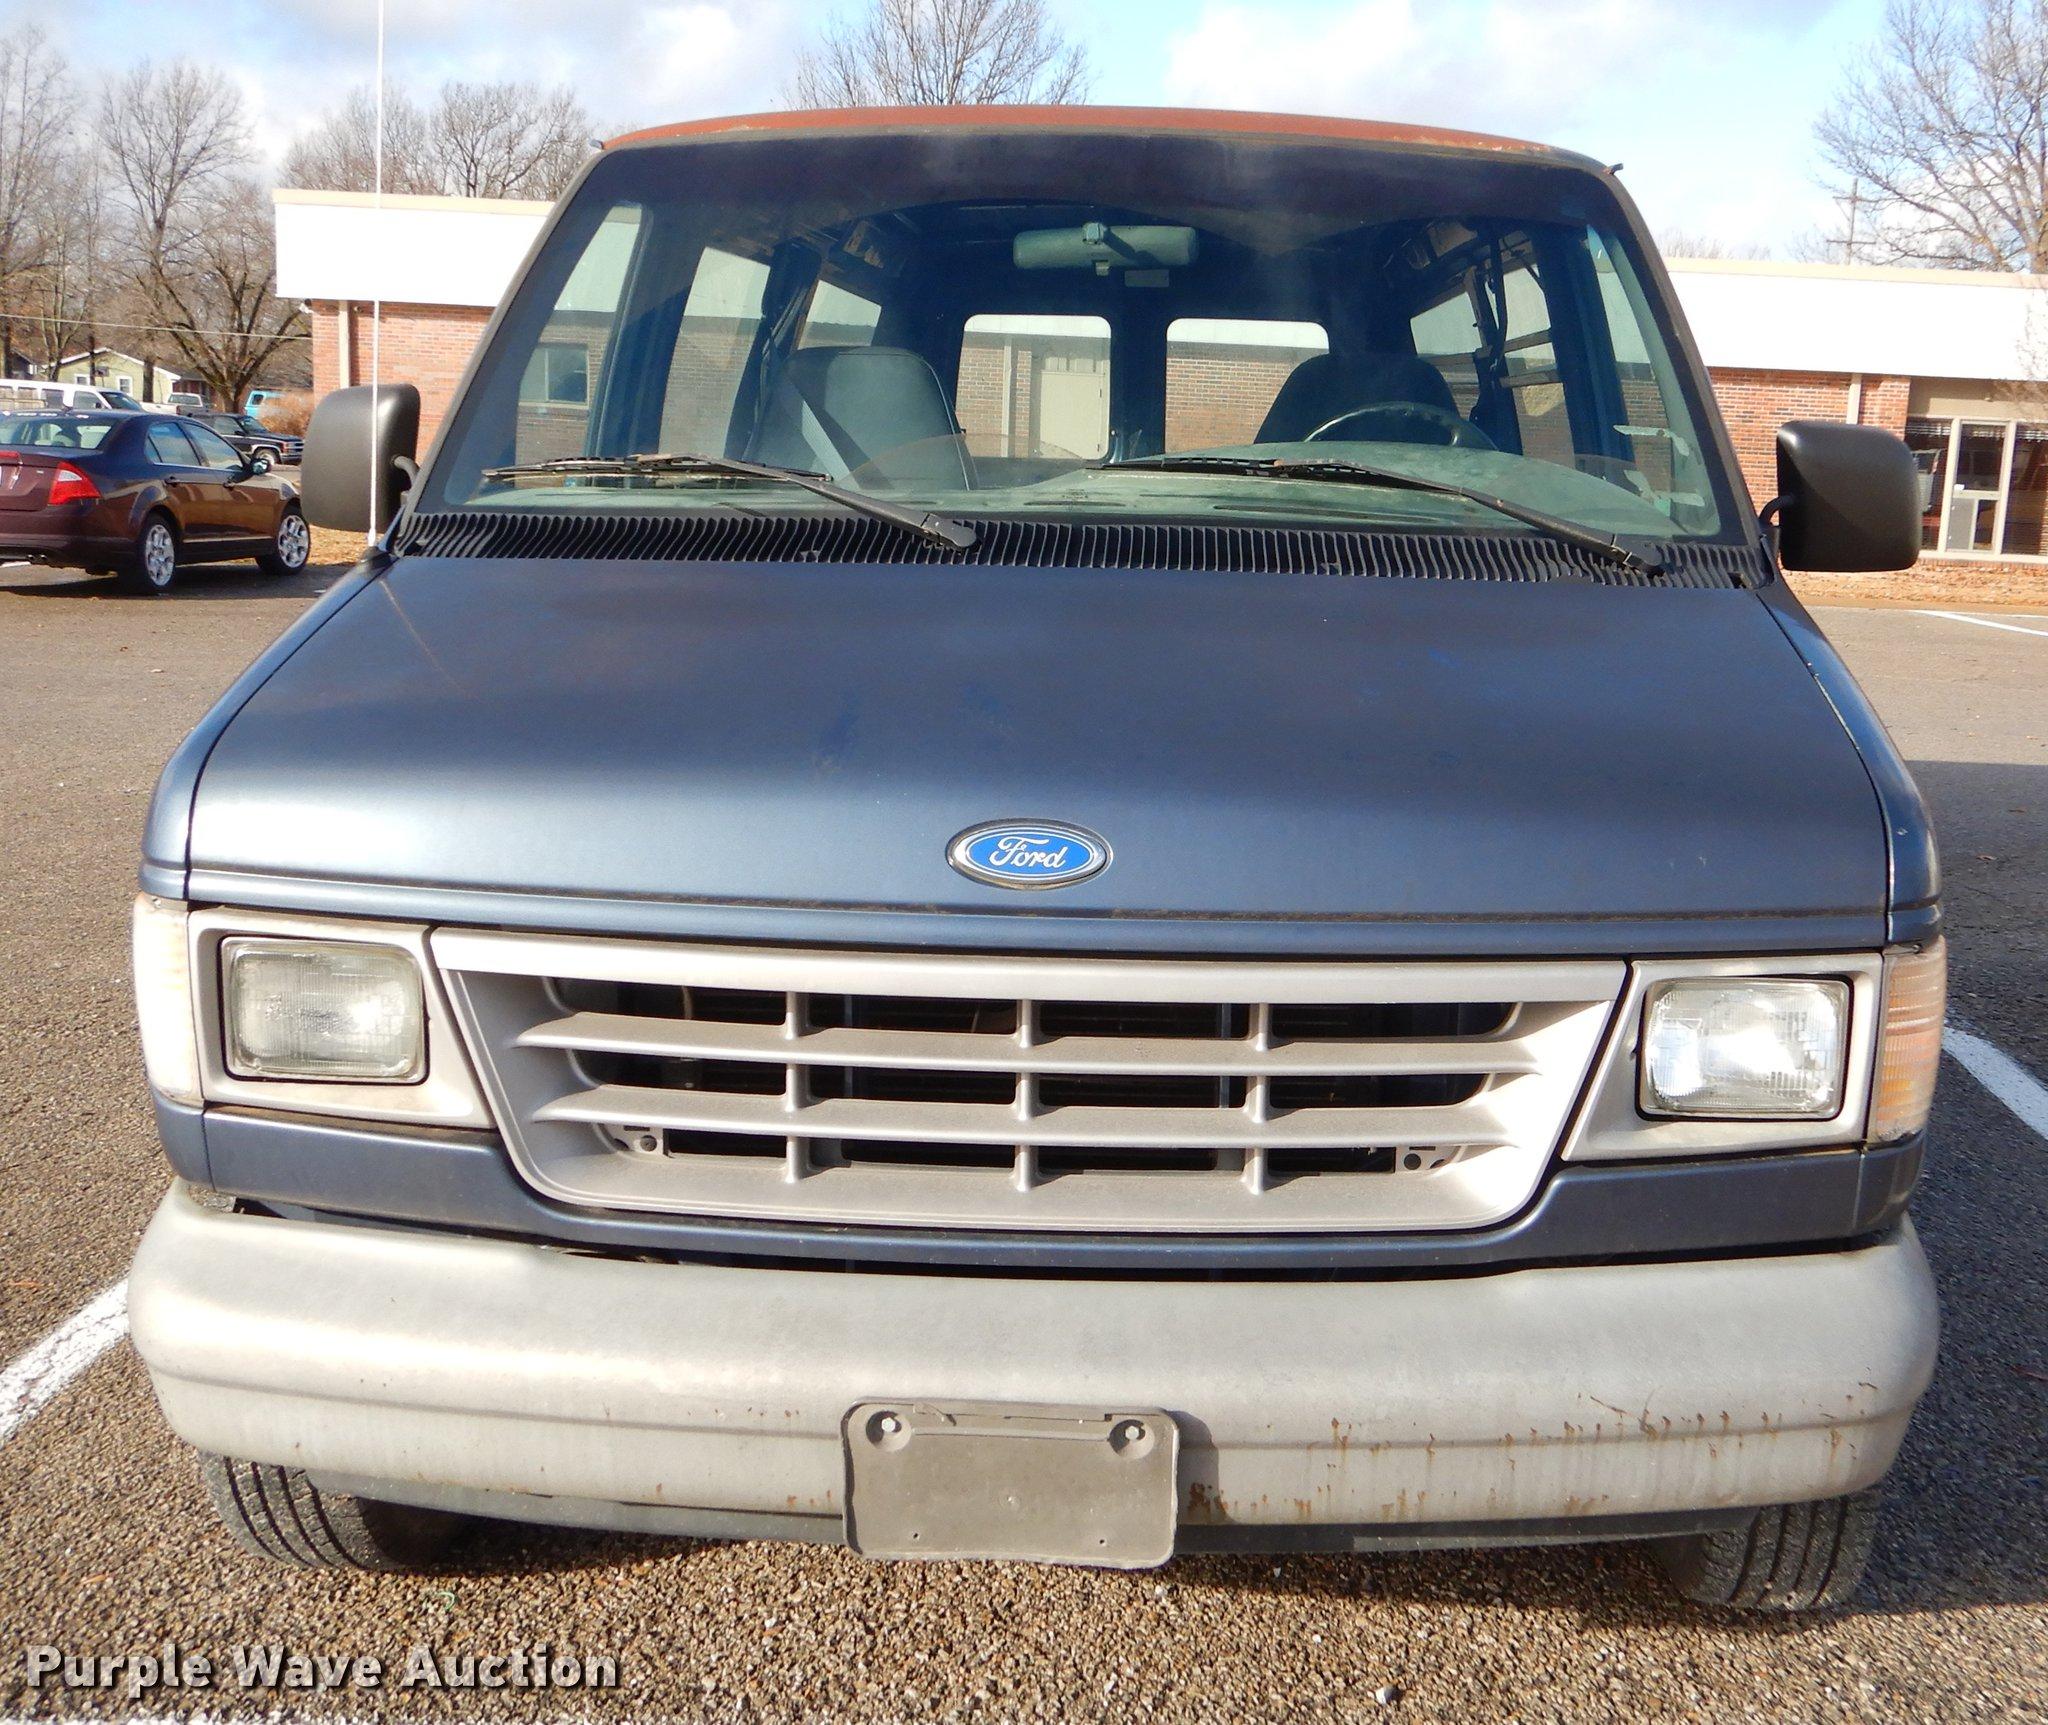 1996 Ford Econoline E150 van | Item ER9375 | Tuesday January